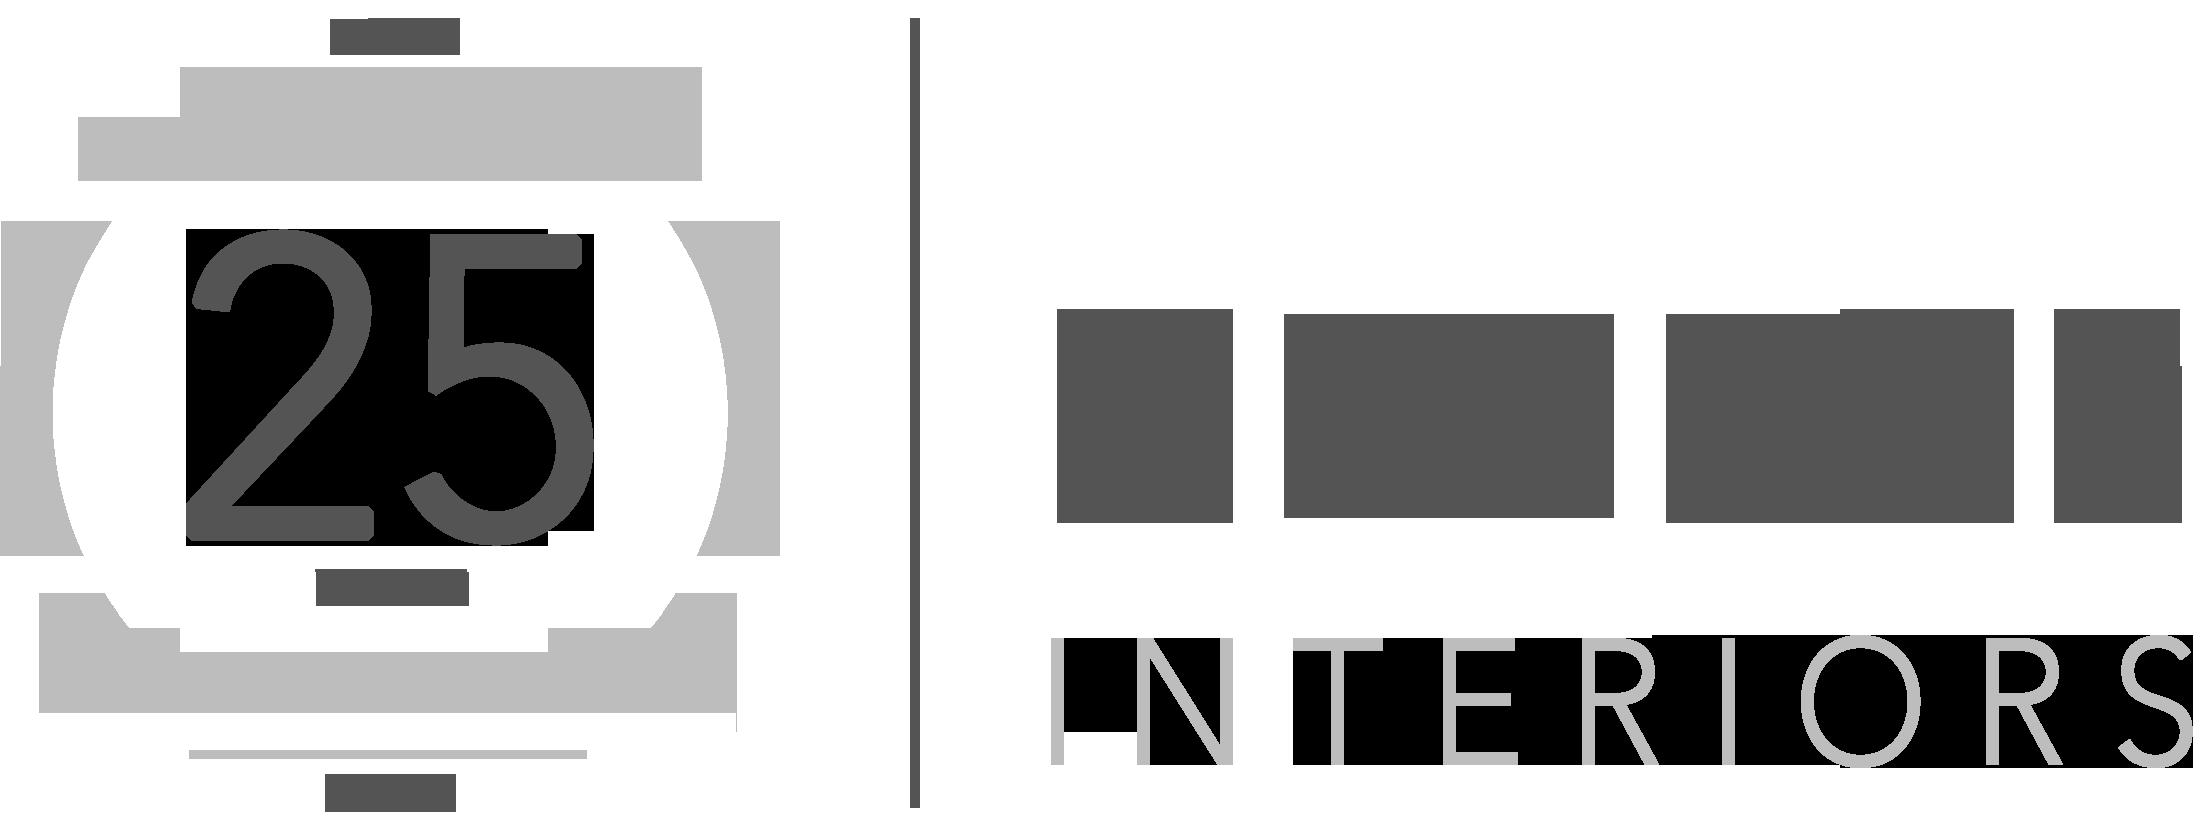 Genesis 25th anniversary logo